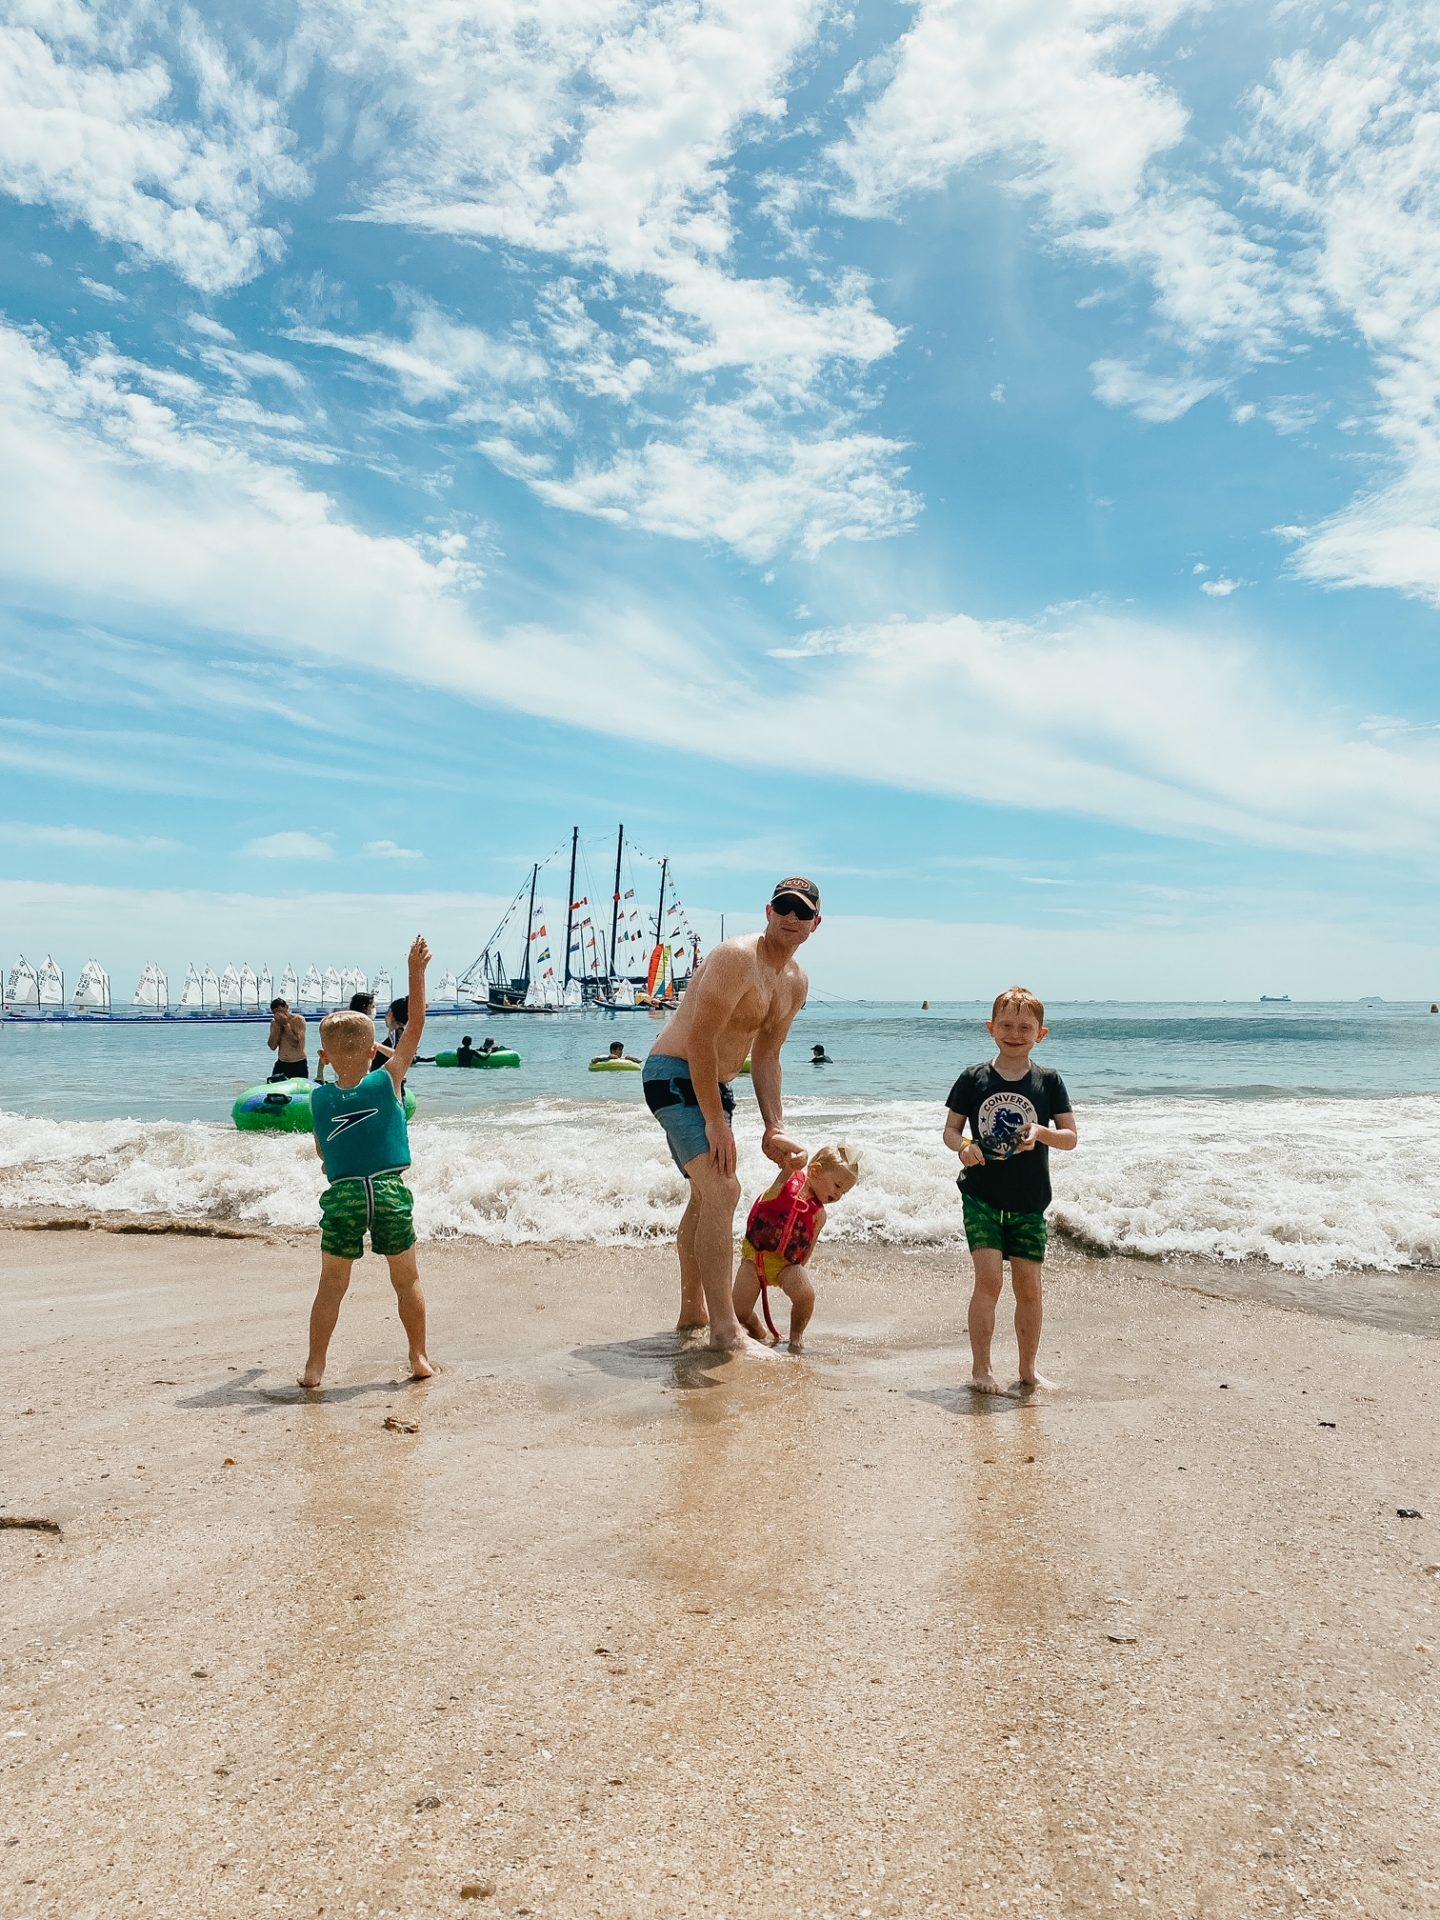 daechon beach day trip